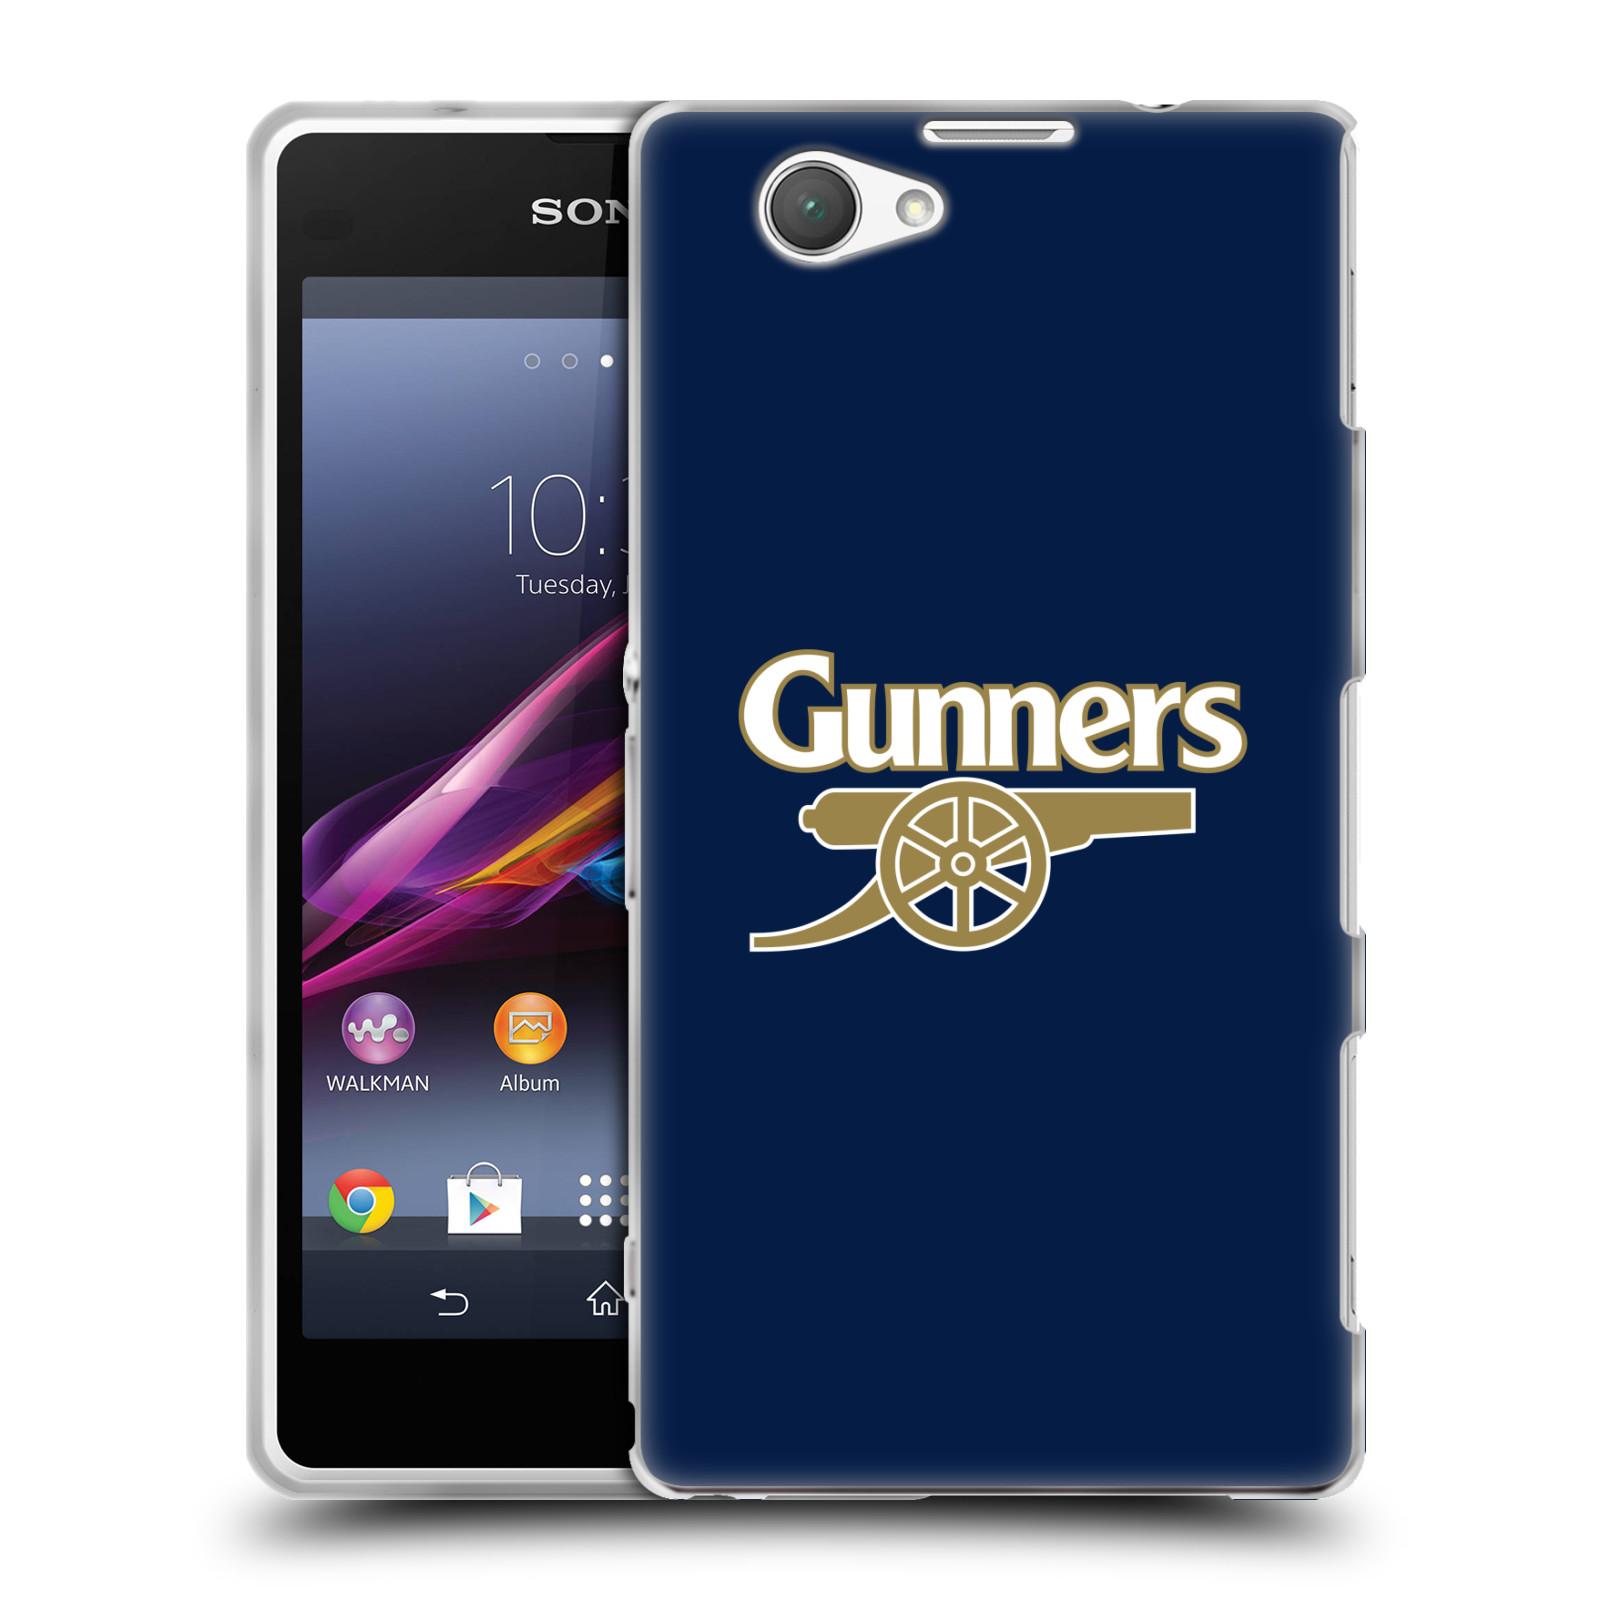 Silikonové pouzdro na mobil Sony Xperia Z1 Compact D5503 - Head Case - Arsenal FC - Gunners